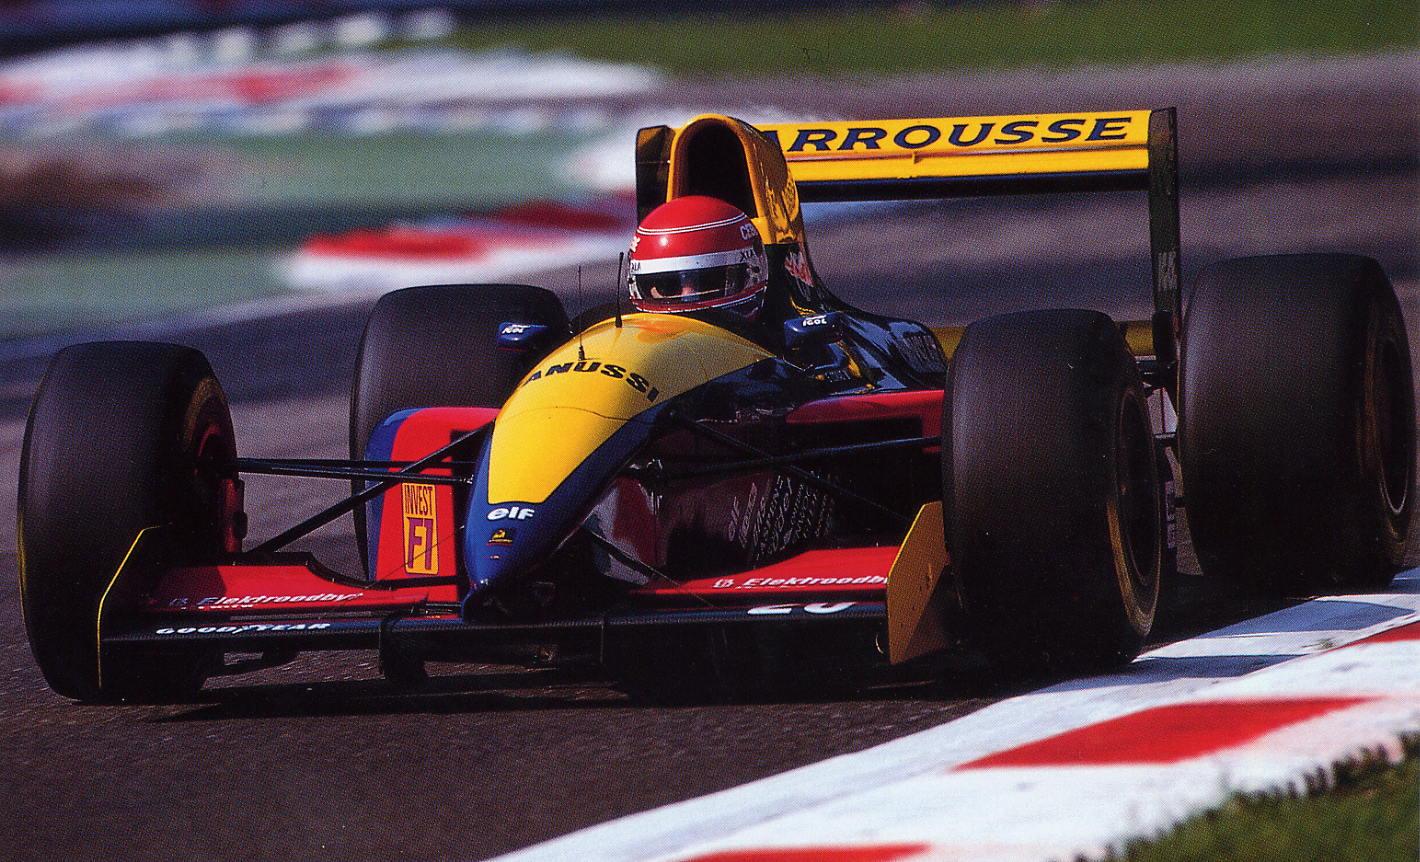 Temporada de Formula 1 de 1993, Larrousse f1 bandverde